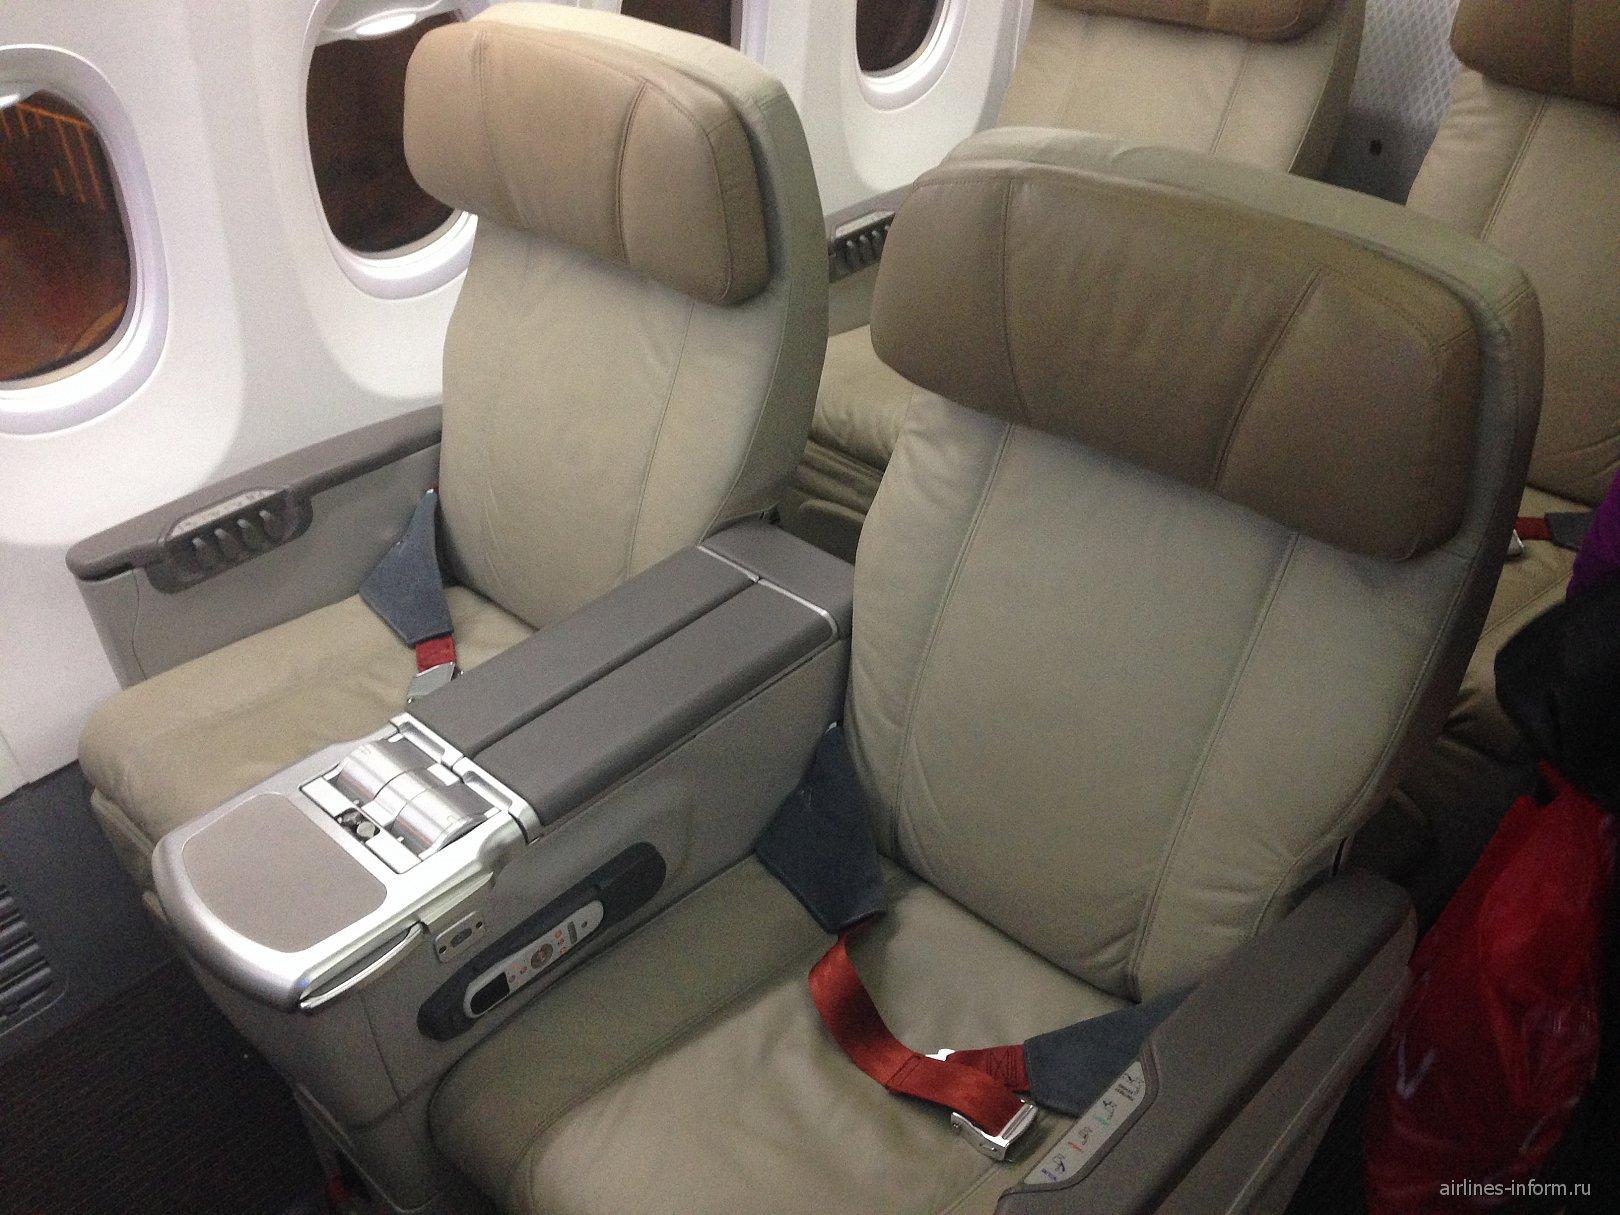 Салон бизнес-класса в самолете Боинг-737-900 авиакомпании Malindo Air